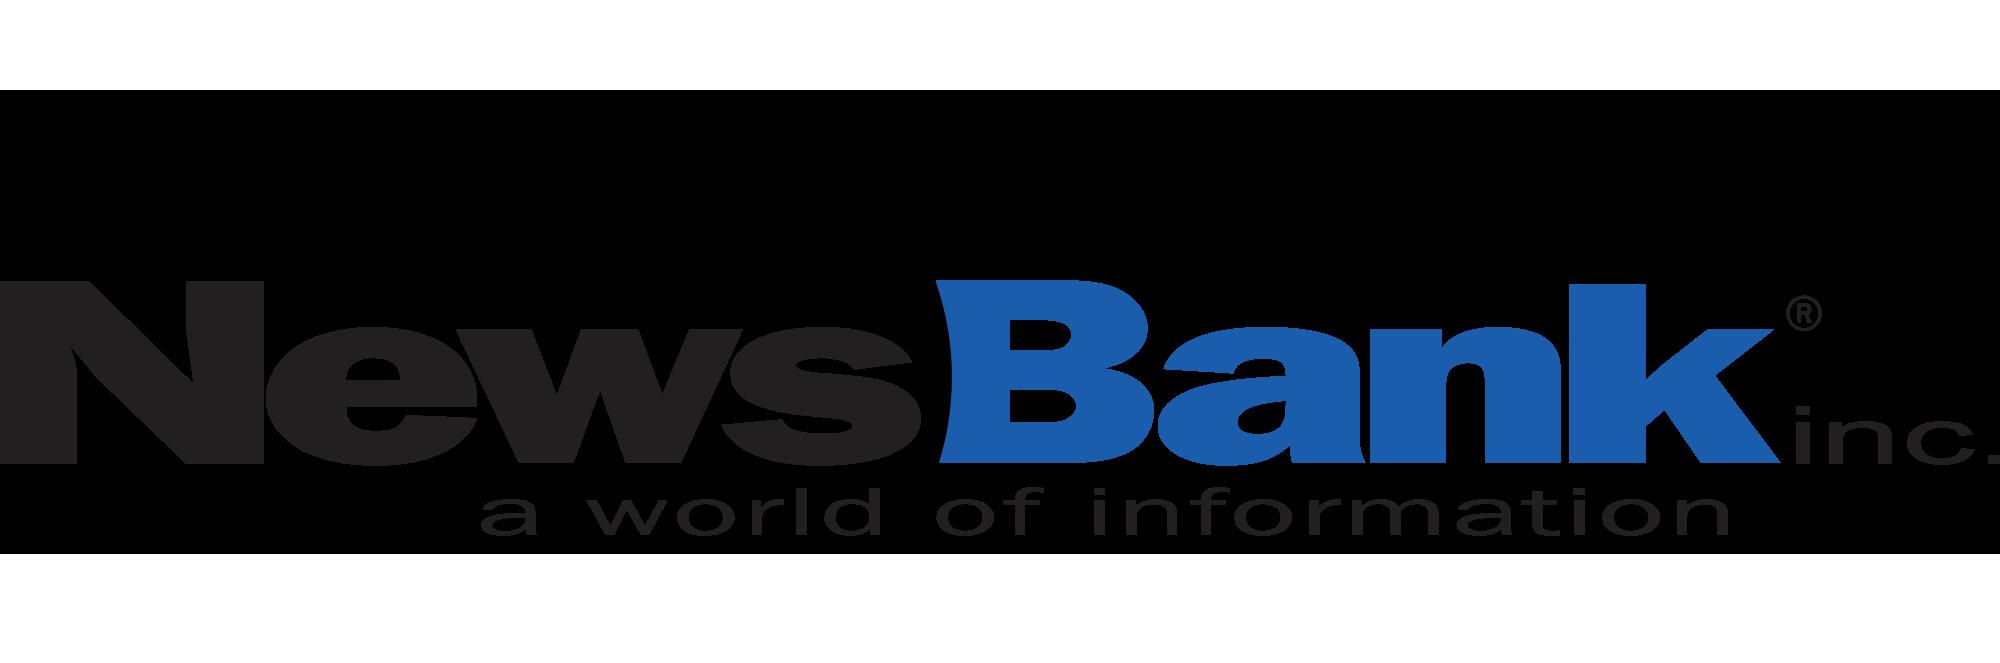 Newsbank: A World of Information.